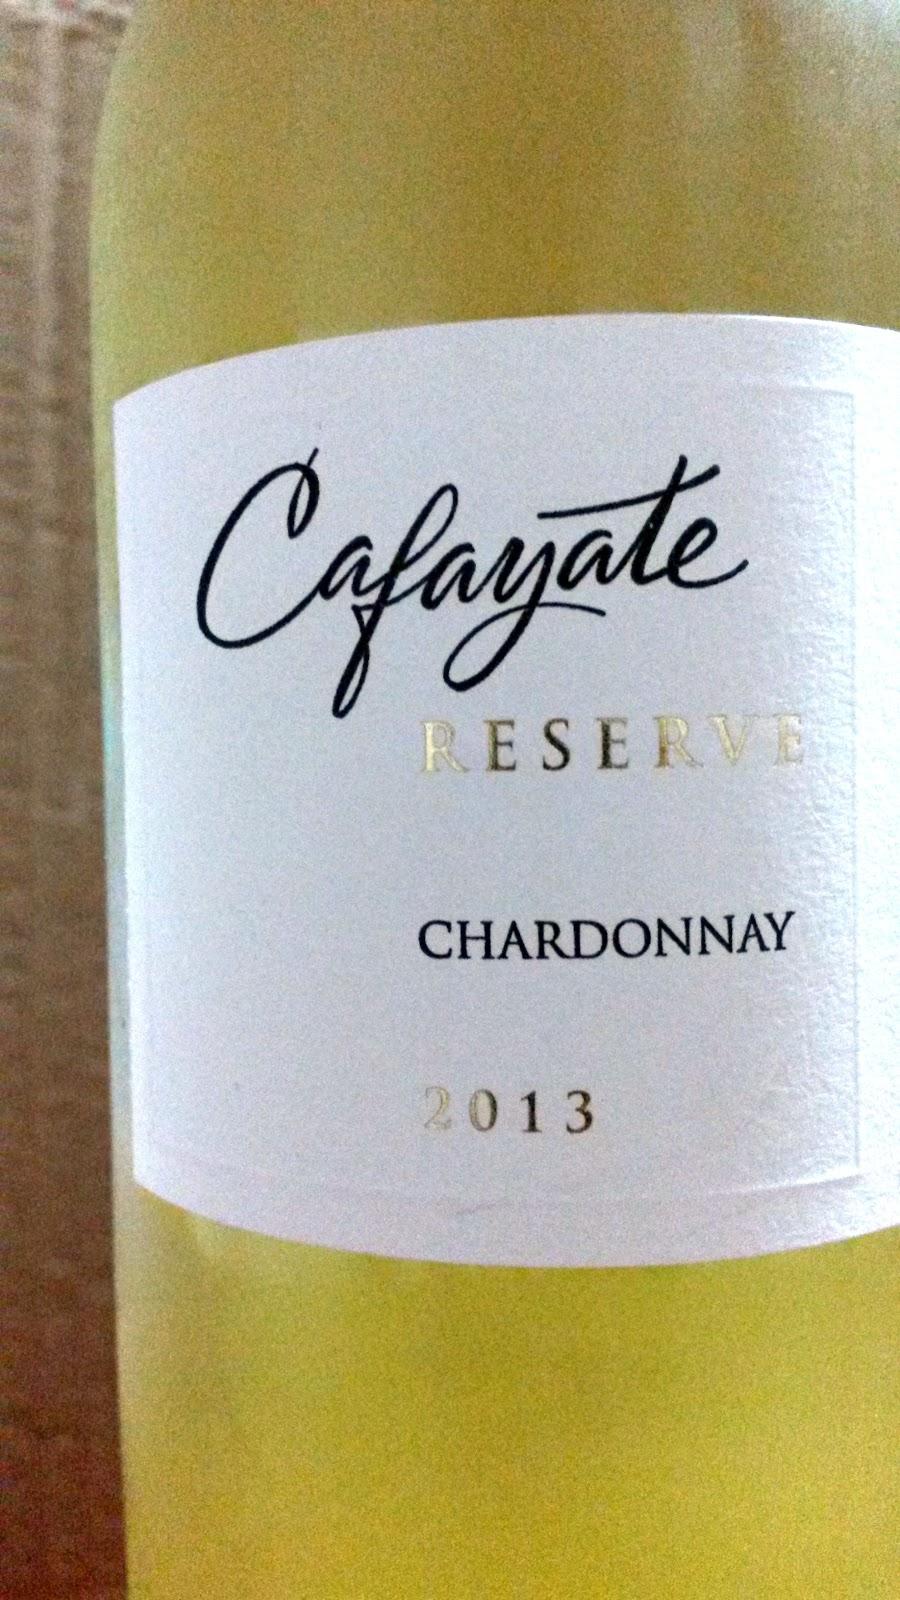 Cafayate Reserve Chardonnay